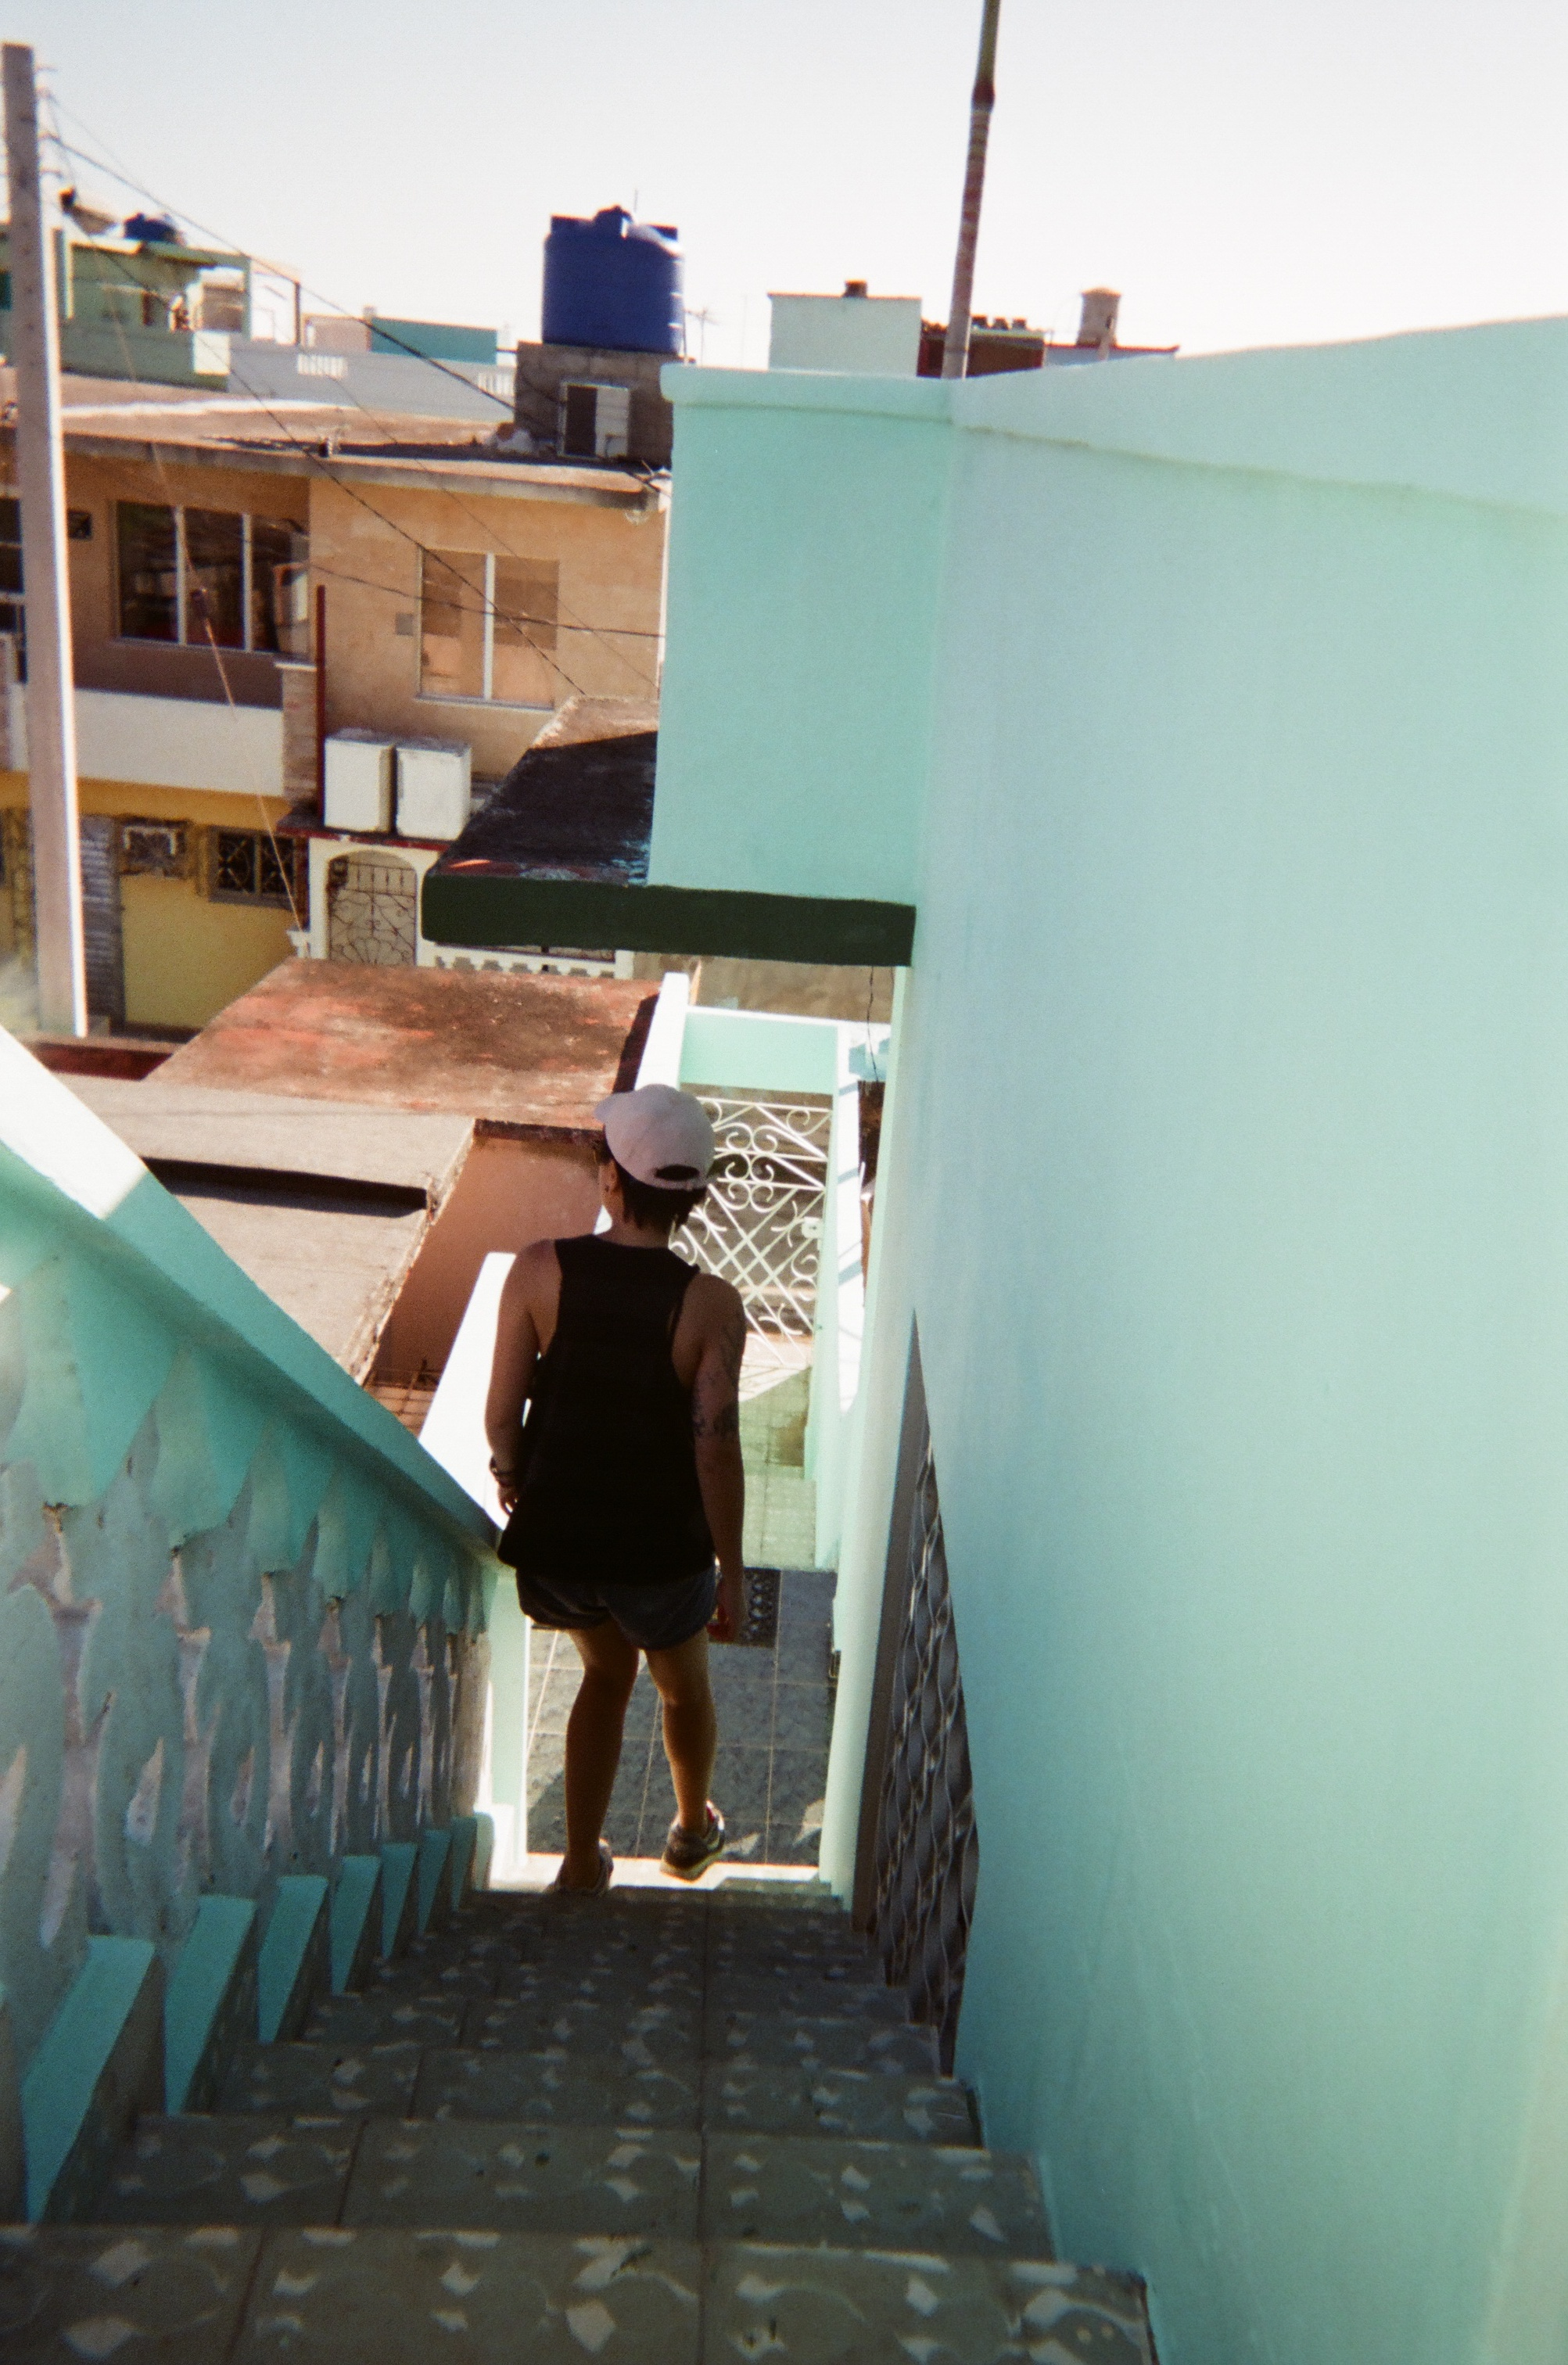 grace on stairs.jpeg